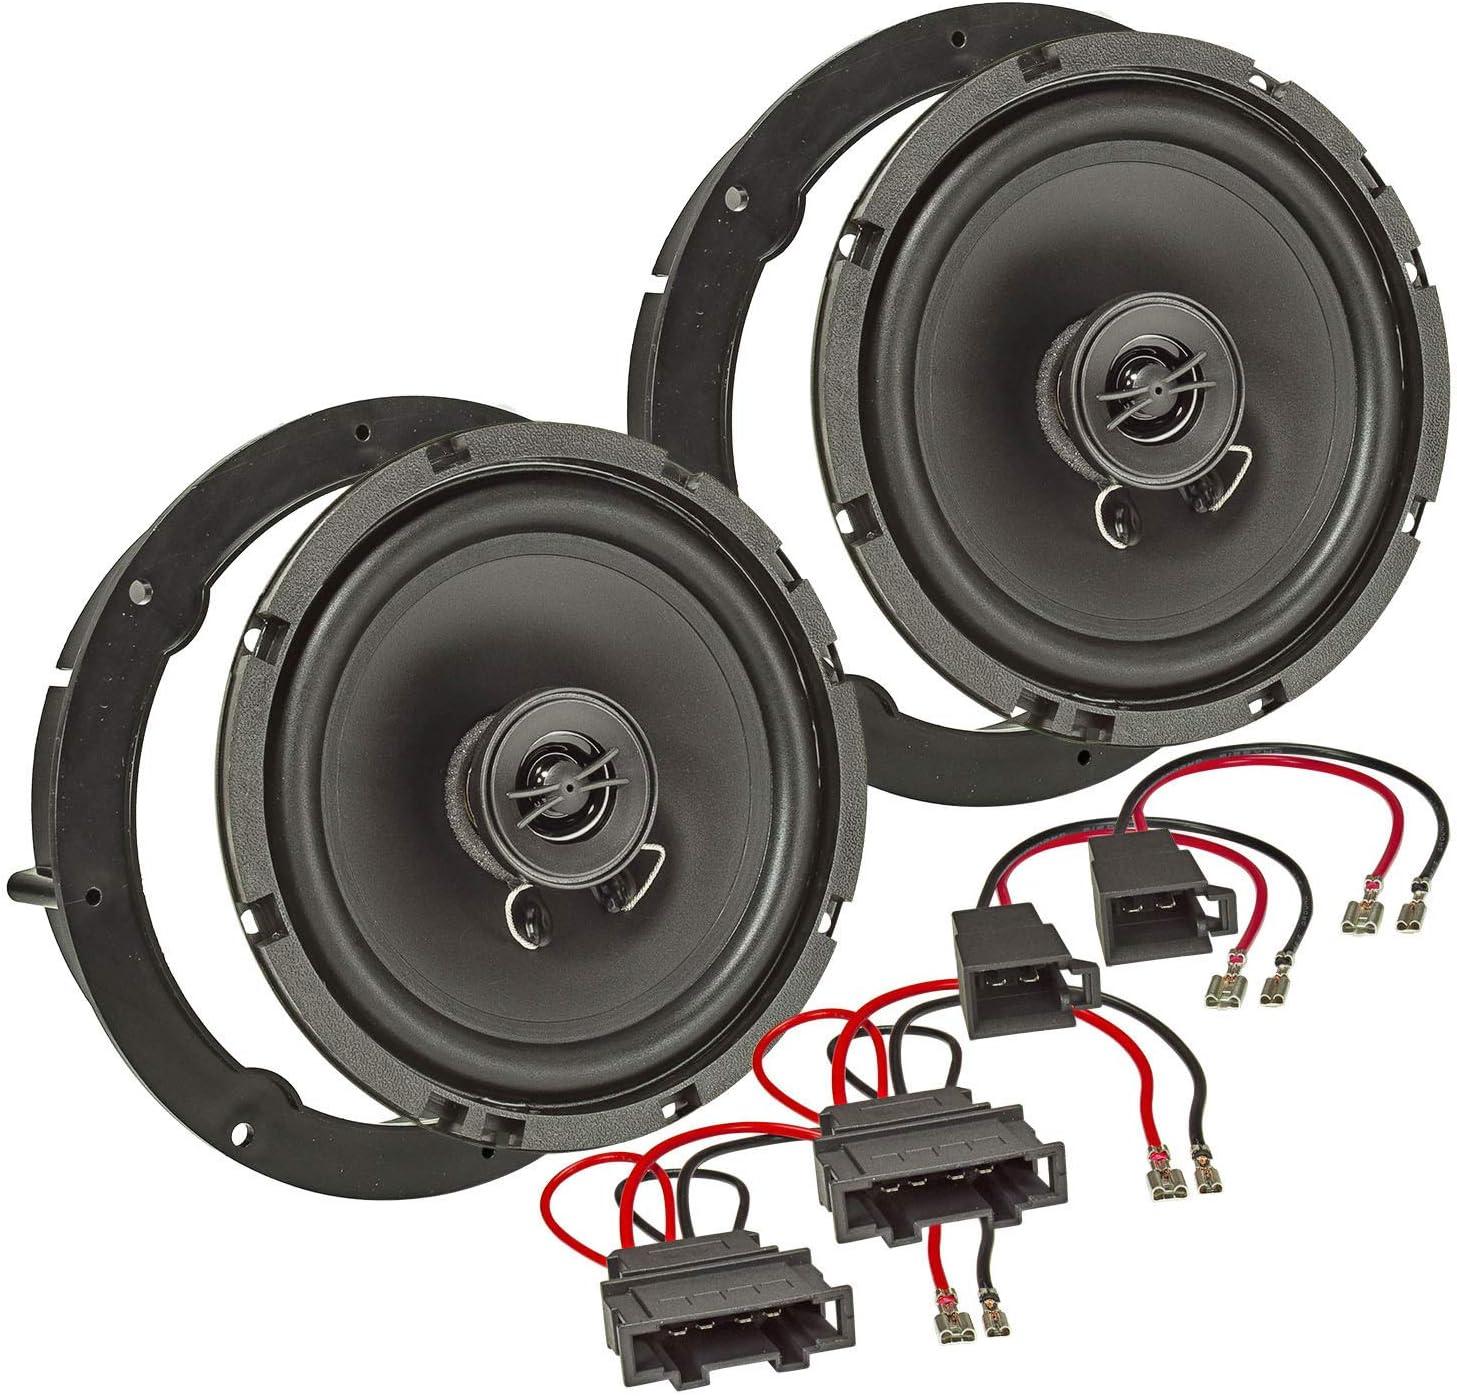 Tomzz Audio 4049 000 Lautsprecher Einbau Set Passend Elektronik